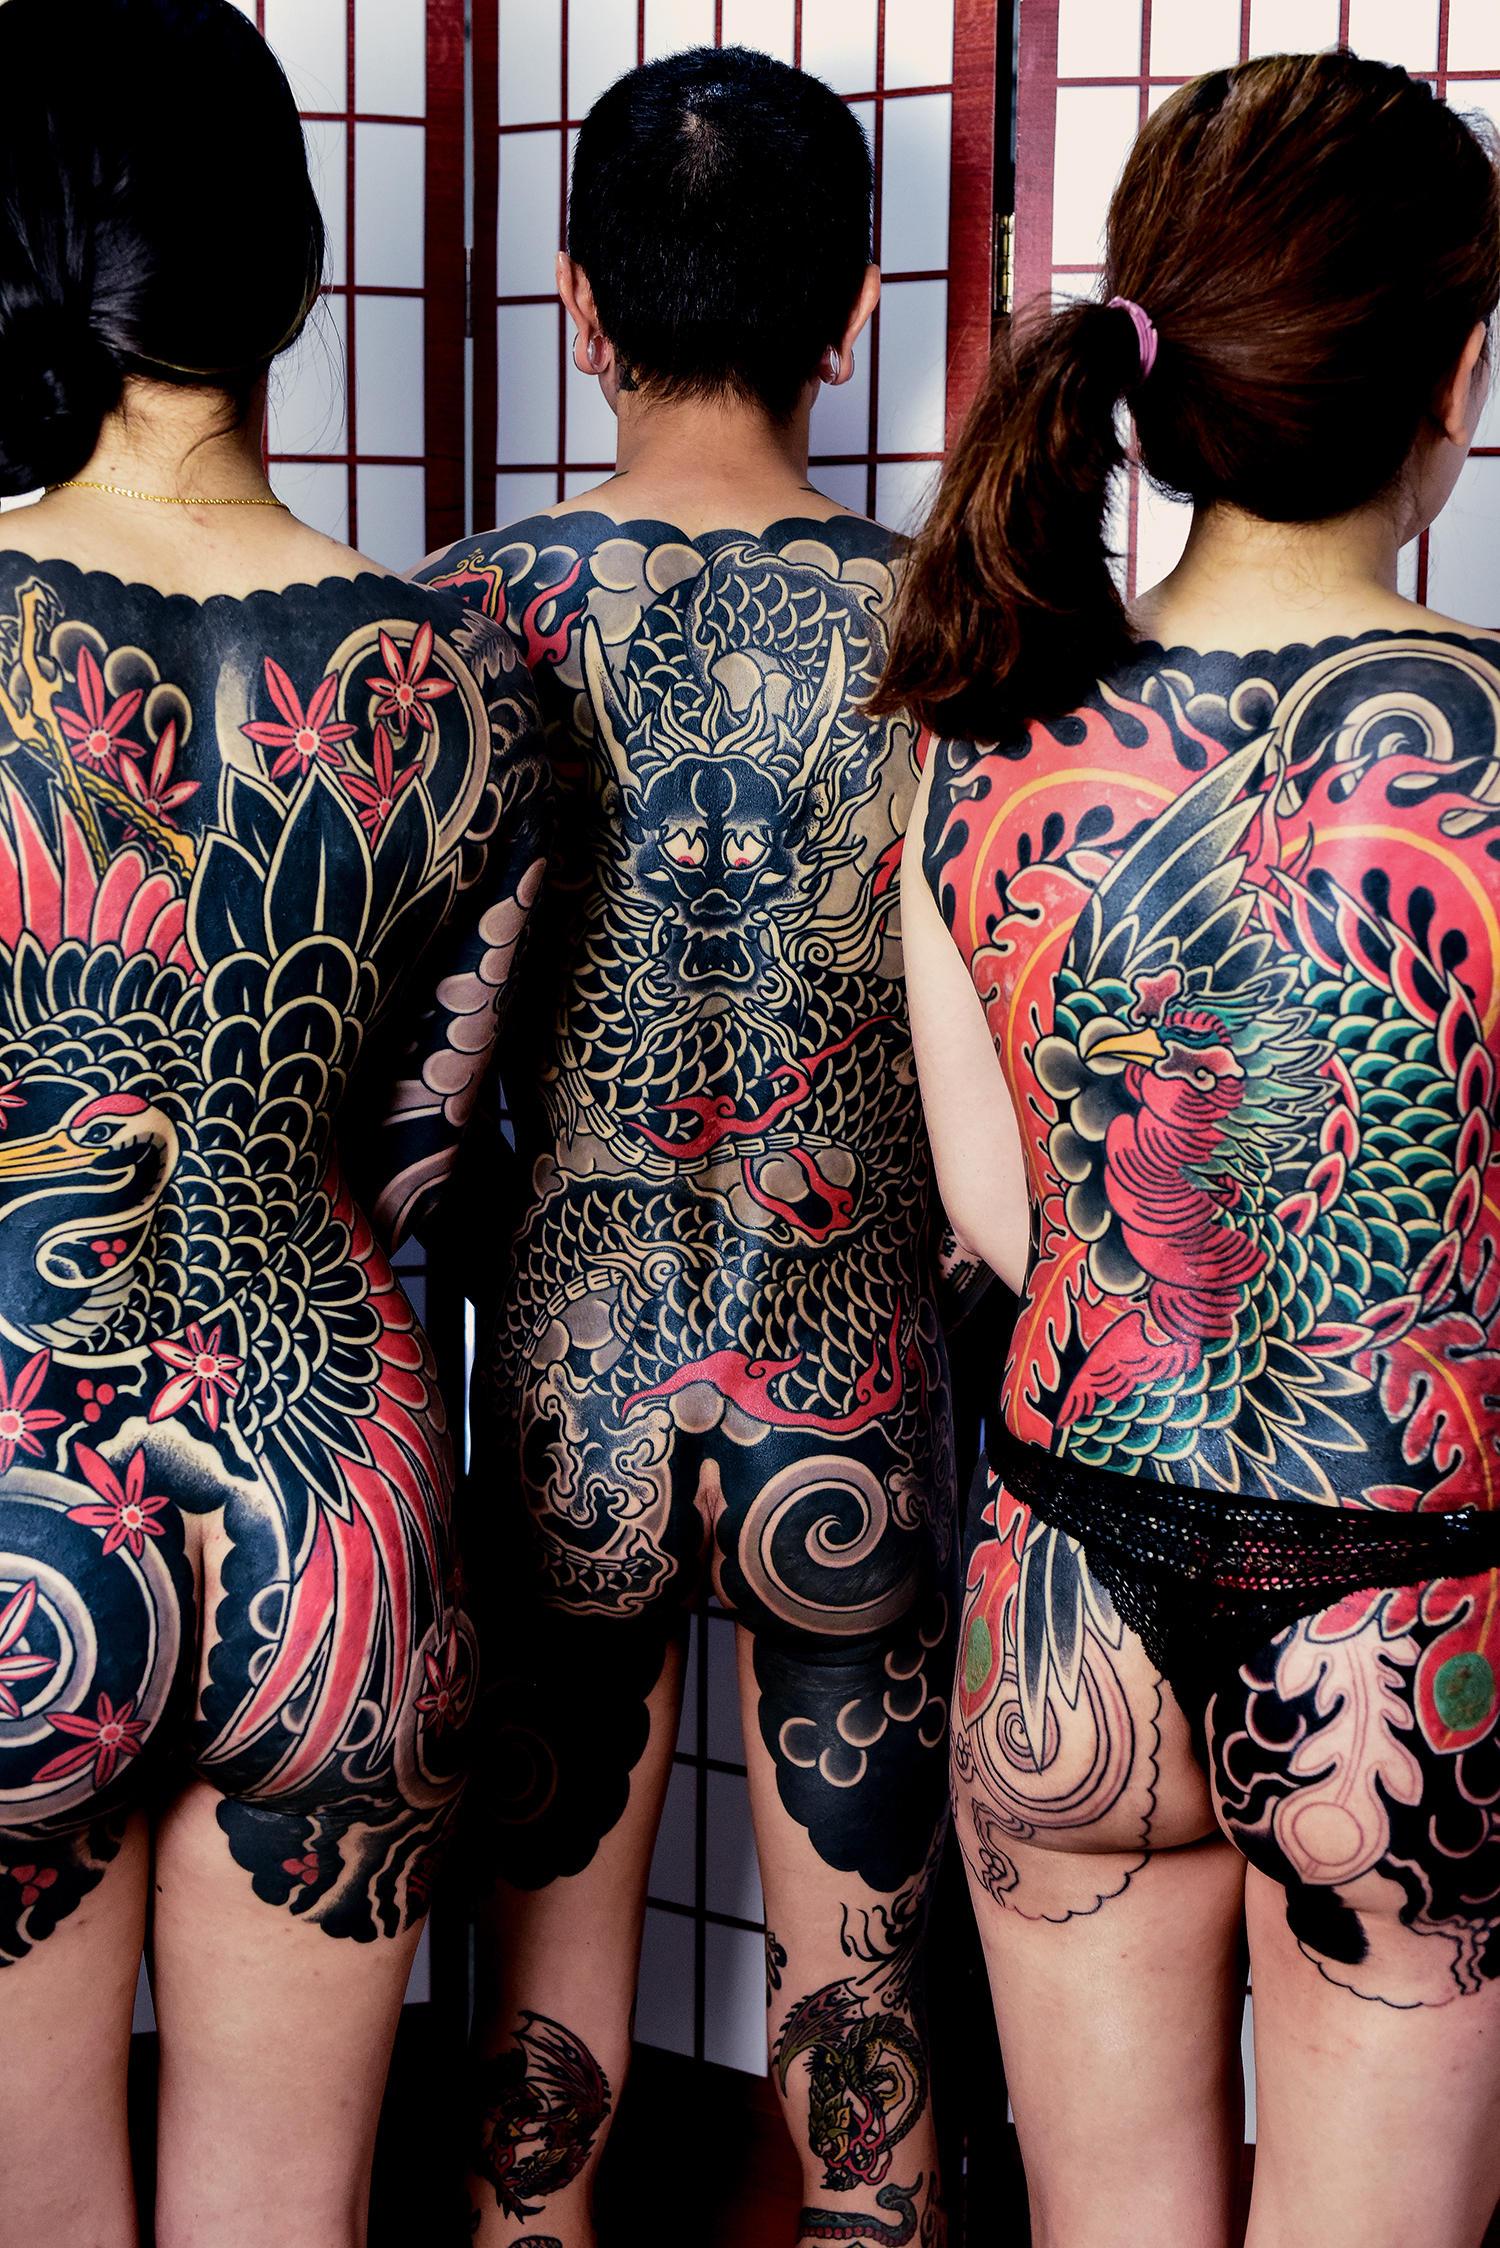 The tattoos depict the following themes: Ysuru (crane), Ryu (dragon), and Hou-Ou (phoenix).